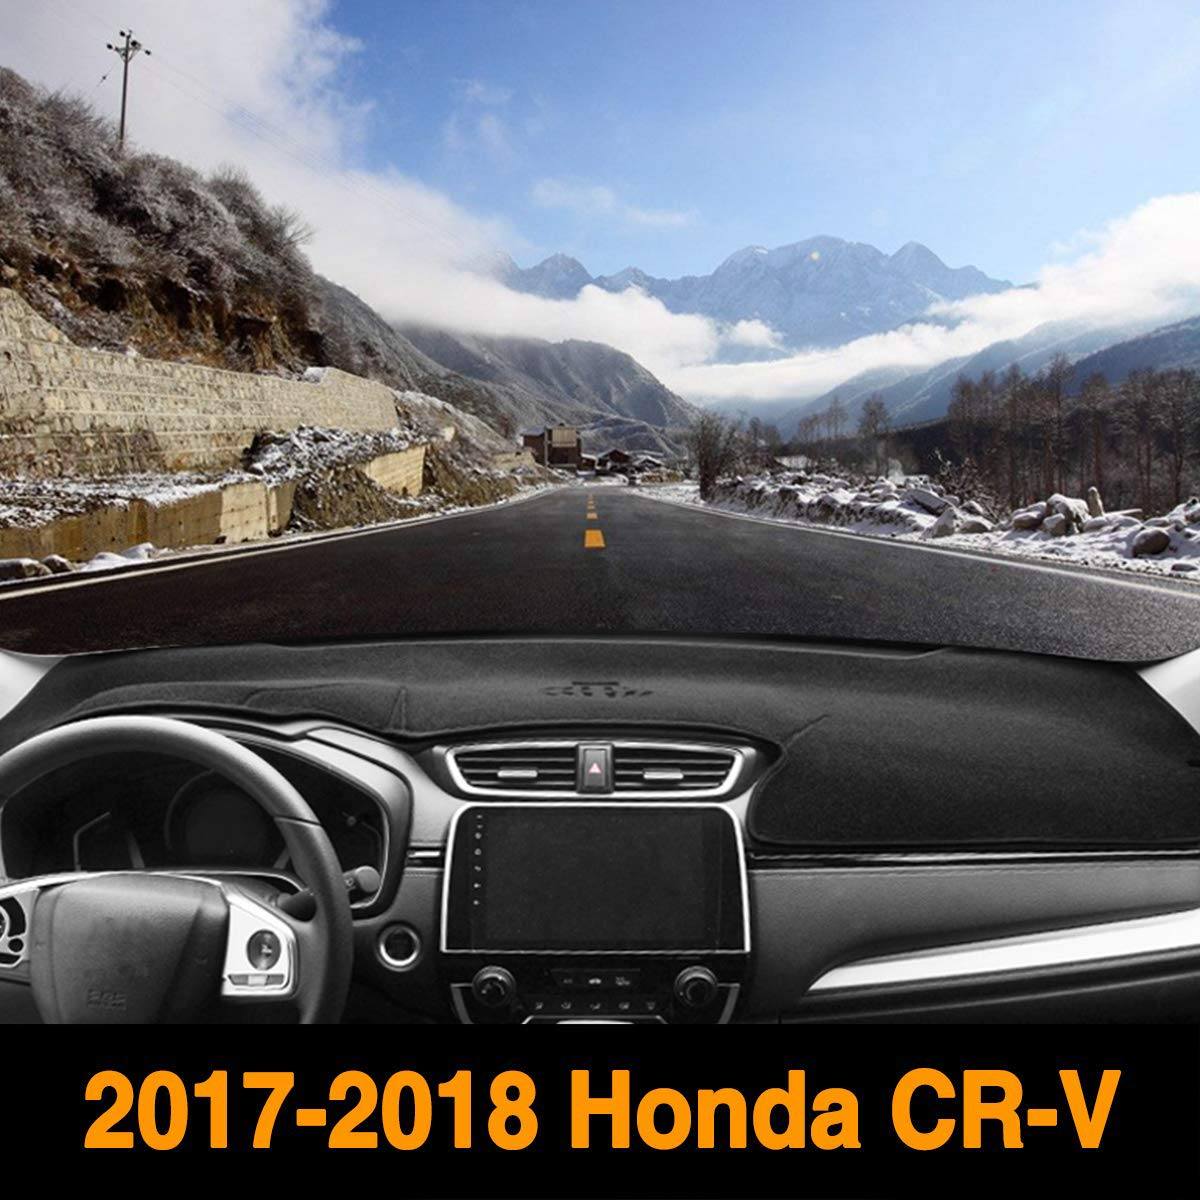 Yeeoy Custom Dashboard Black Center Non-Slip Cover Sunshield Cover Pad Fits 2017 2018 Honda CRV